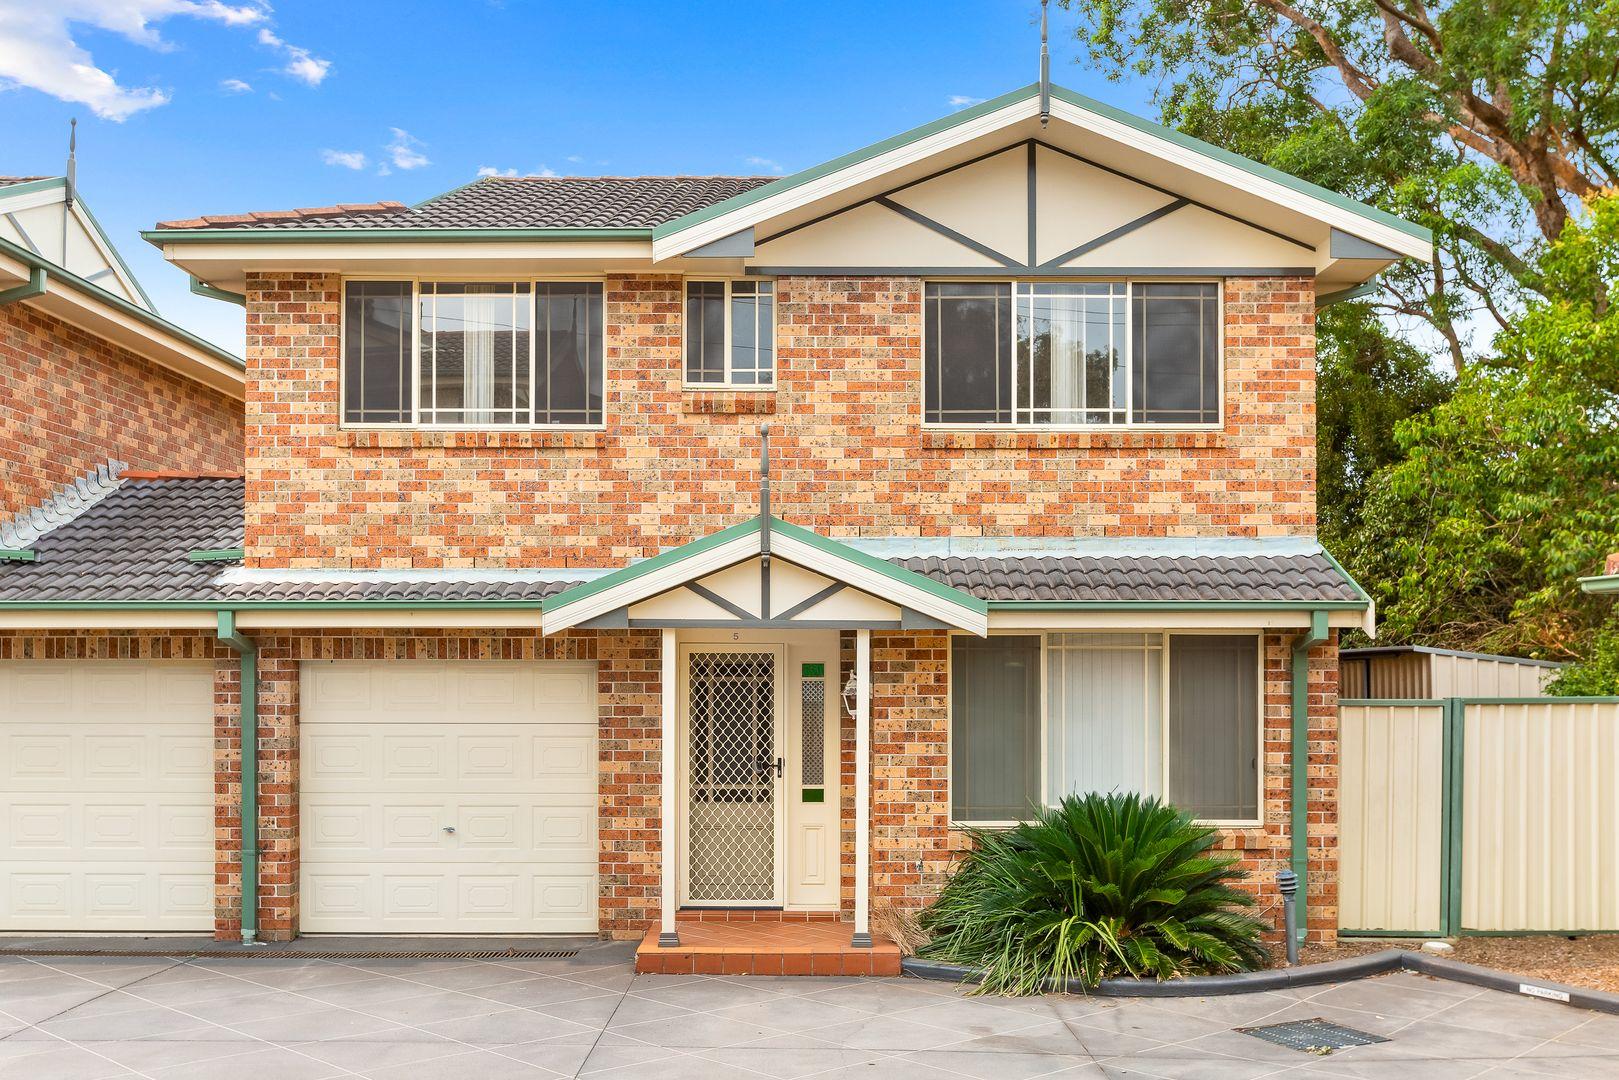 5/115 Caringbah Road, Caringbah NSW 2229, Image 0